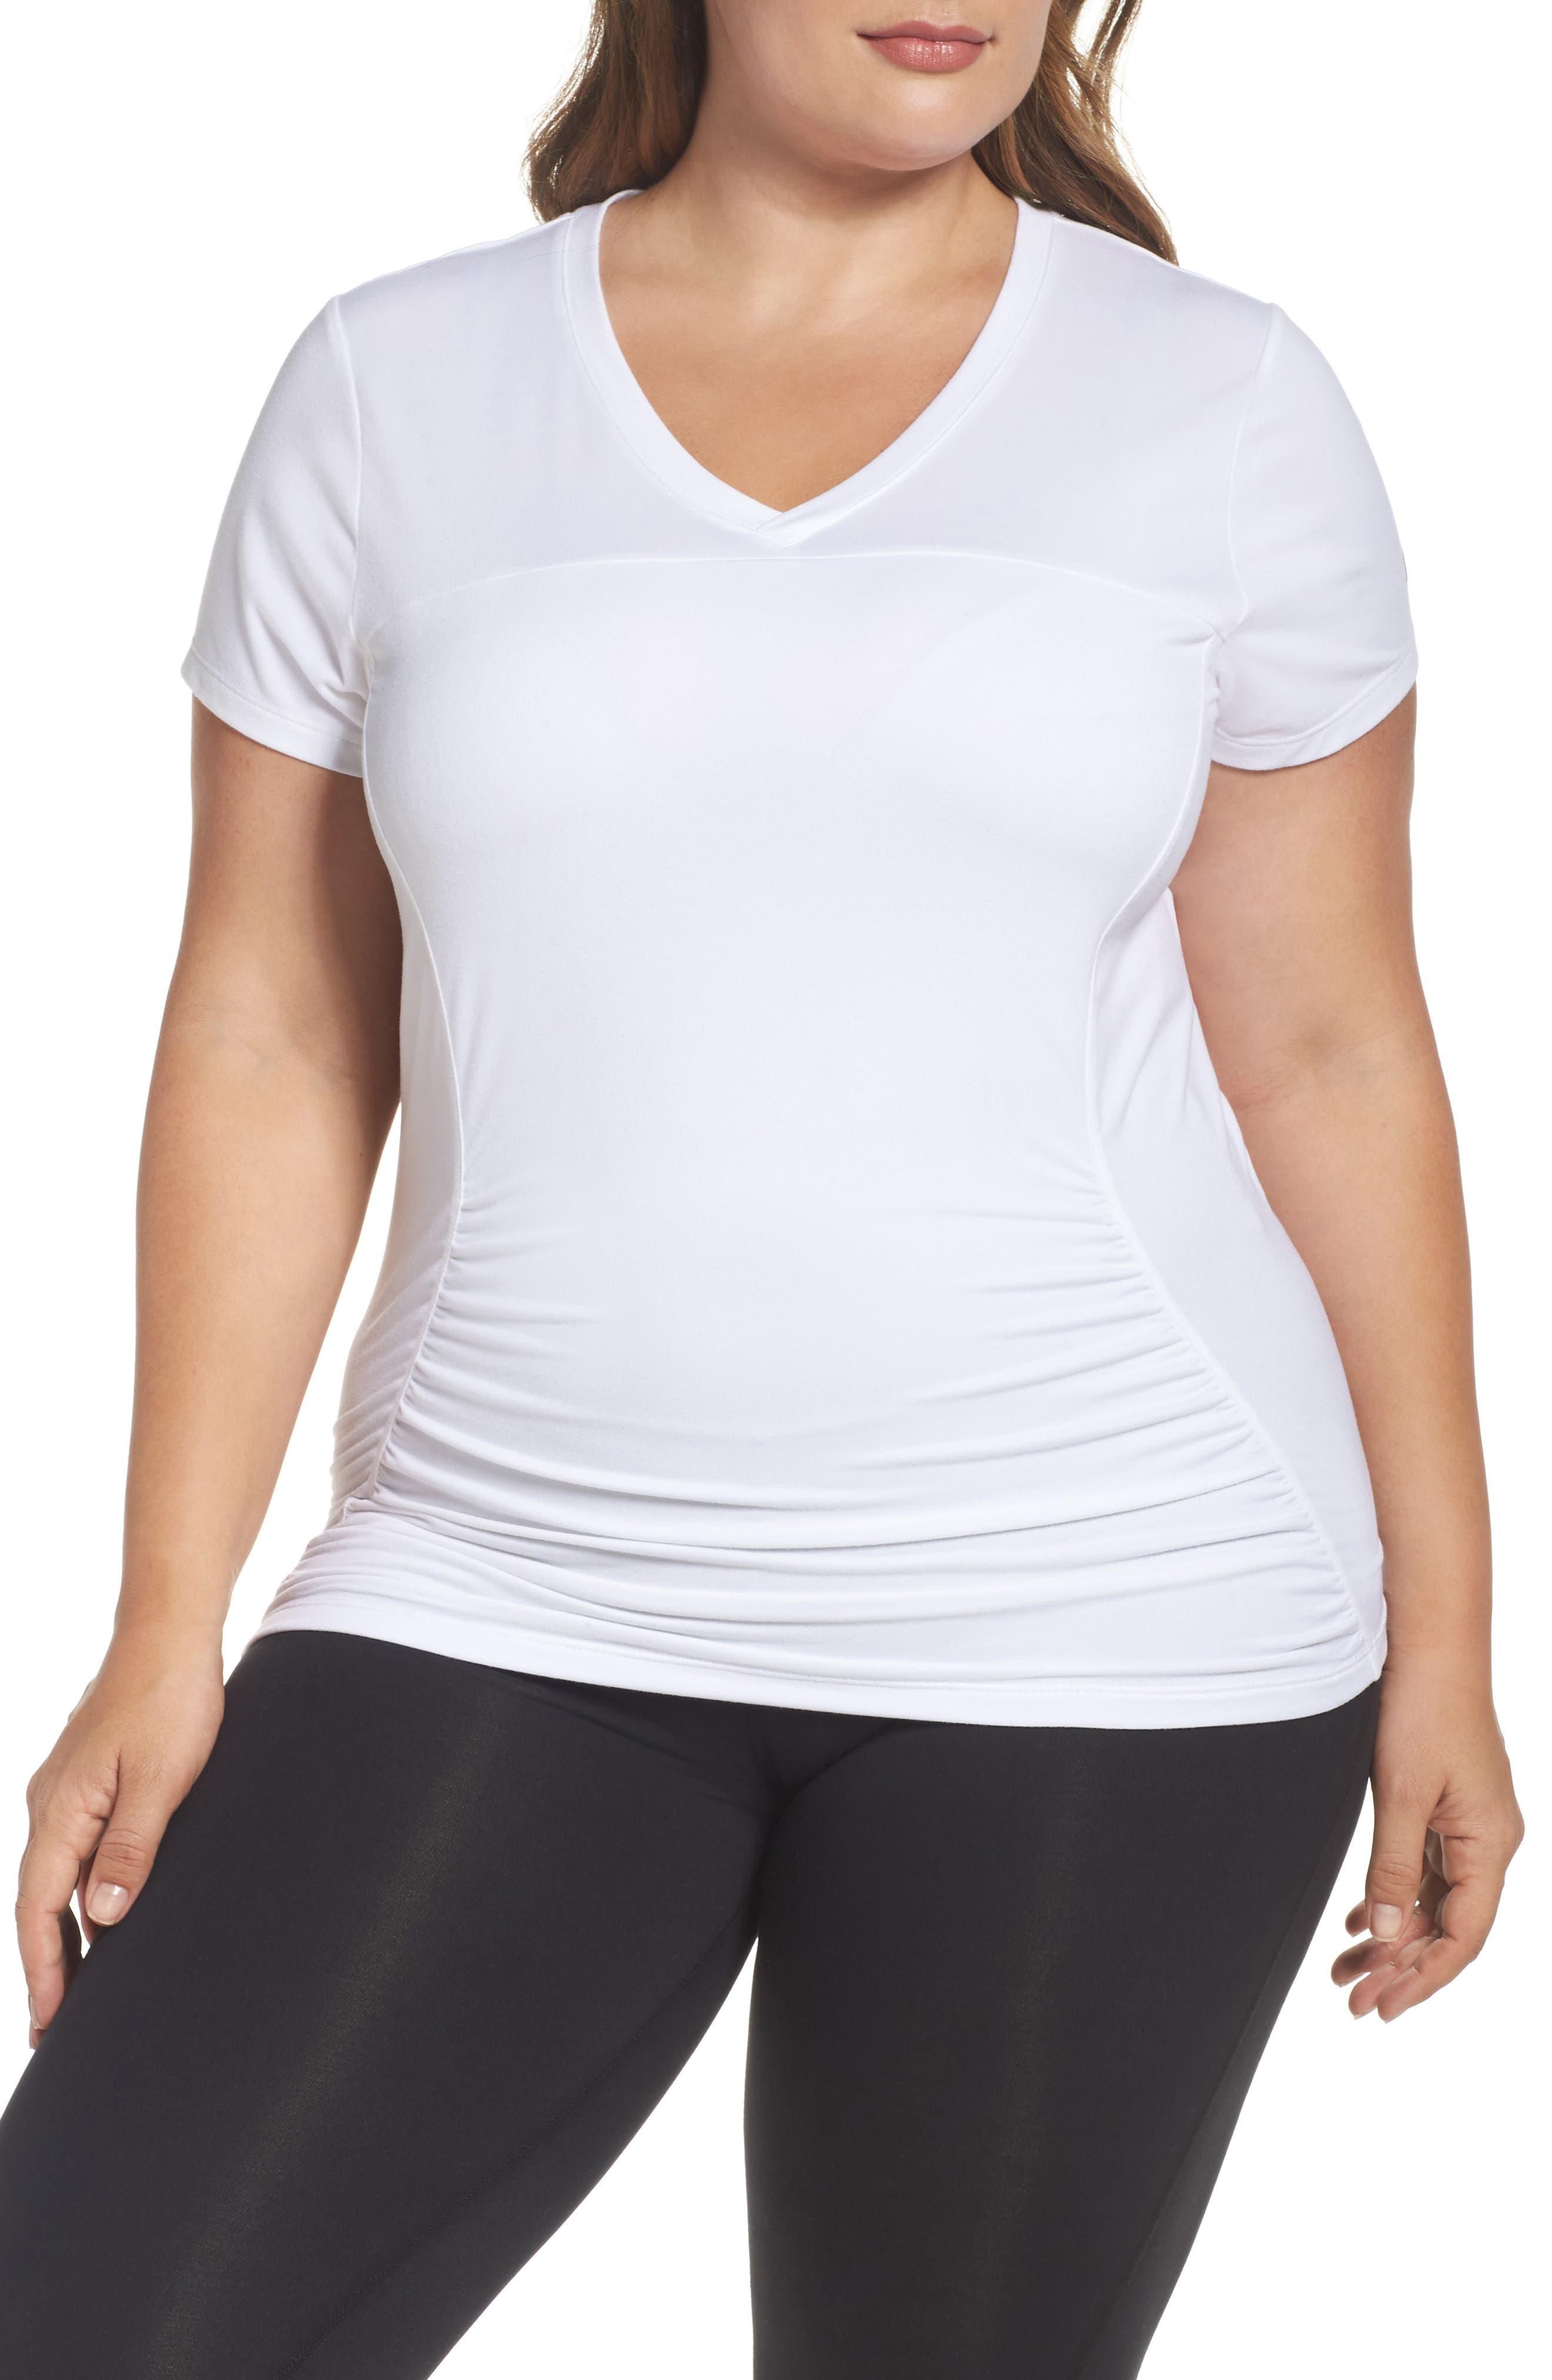 Main Image - Marika Curves 'Elizabeth' Slimming Tee (Plus Size)